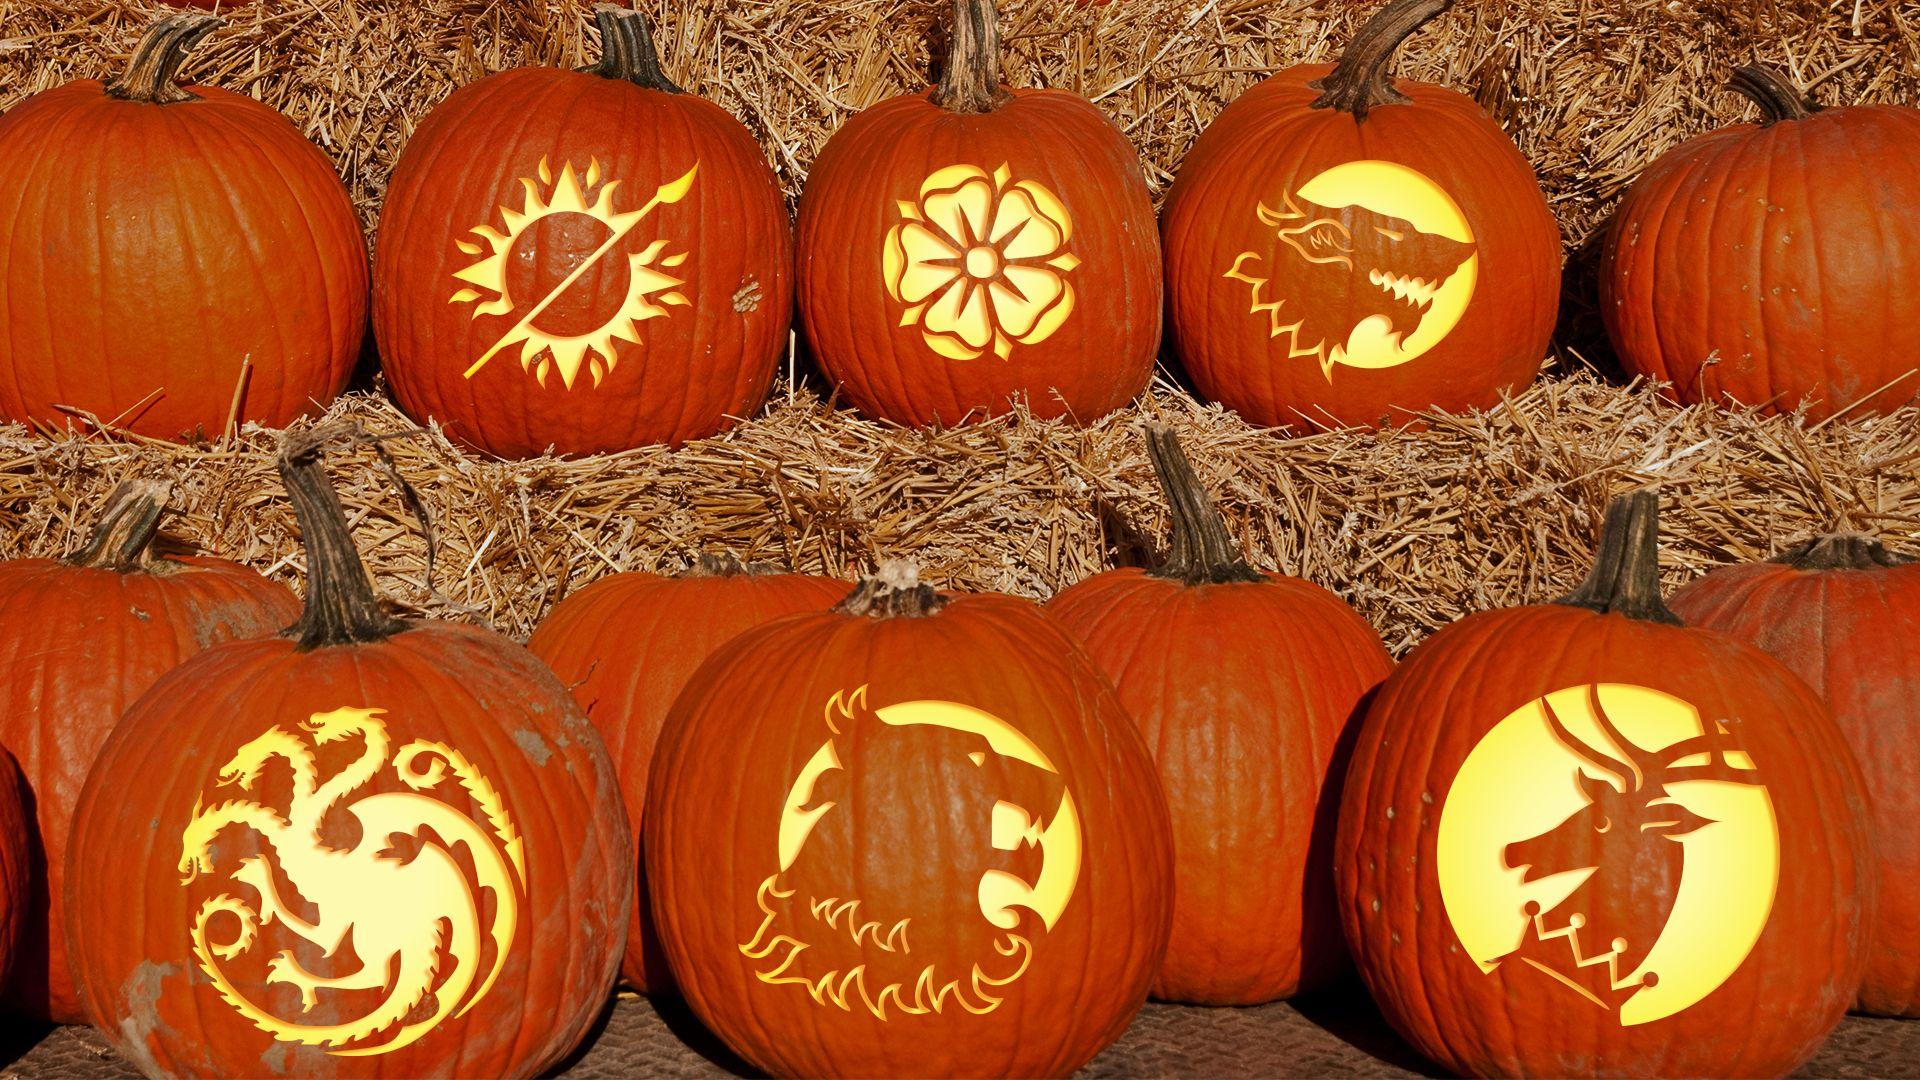 32+ Game of thrones pumpkin ideas ideas